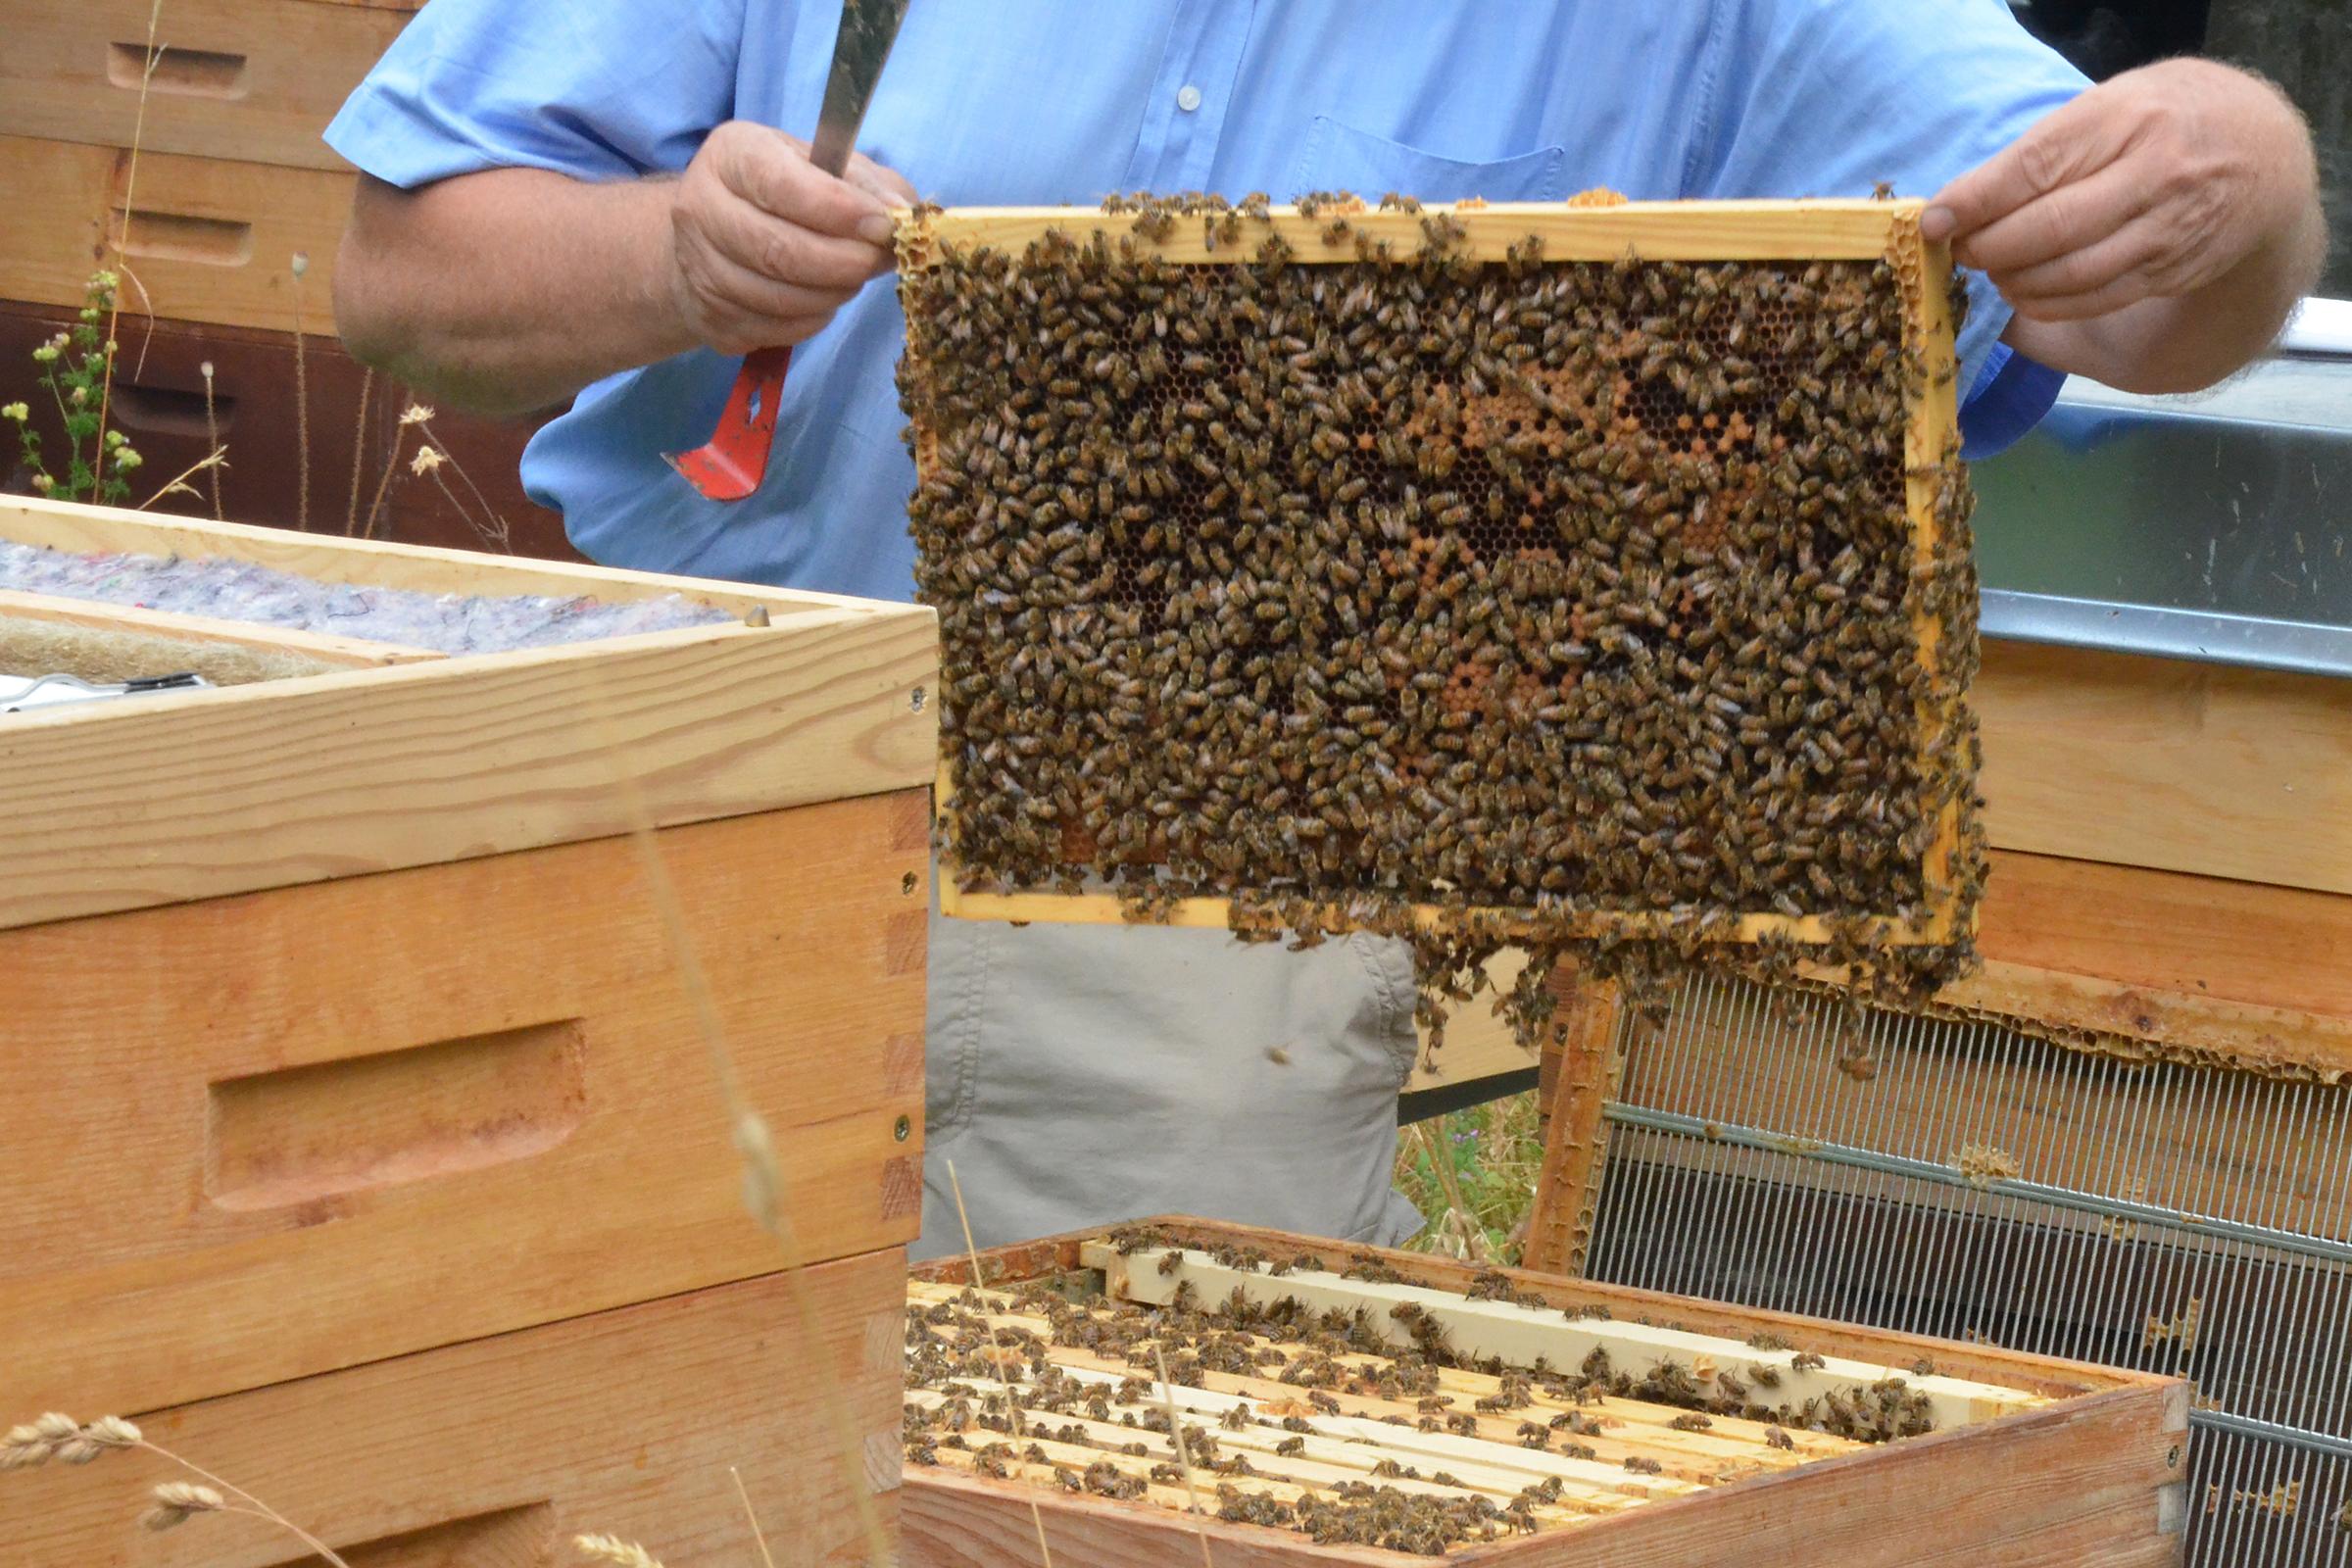 Buckfast-Bienen in der Imkerei Bienenhort Suderwich